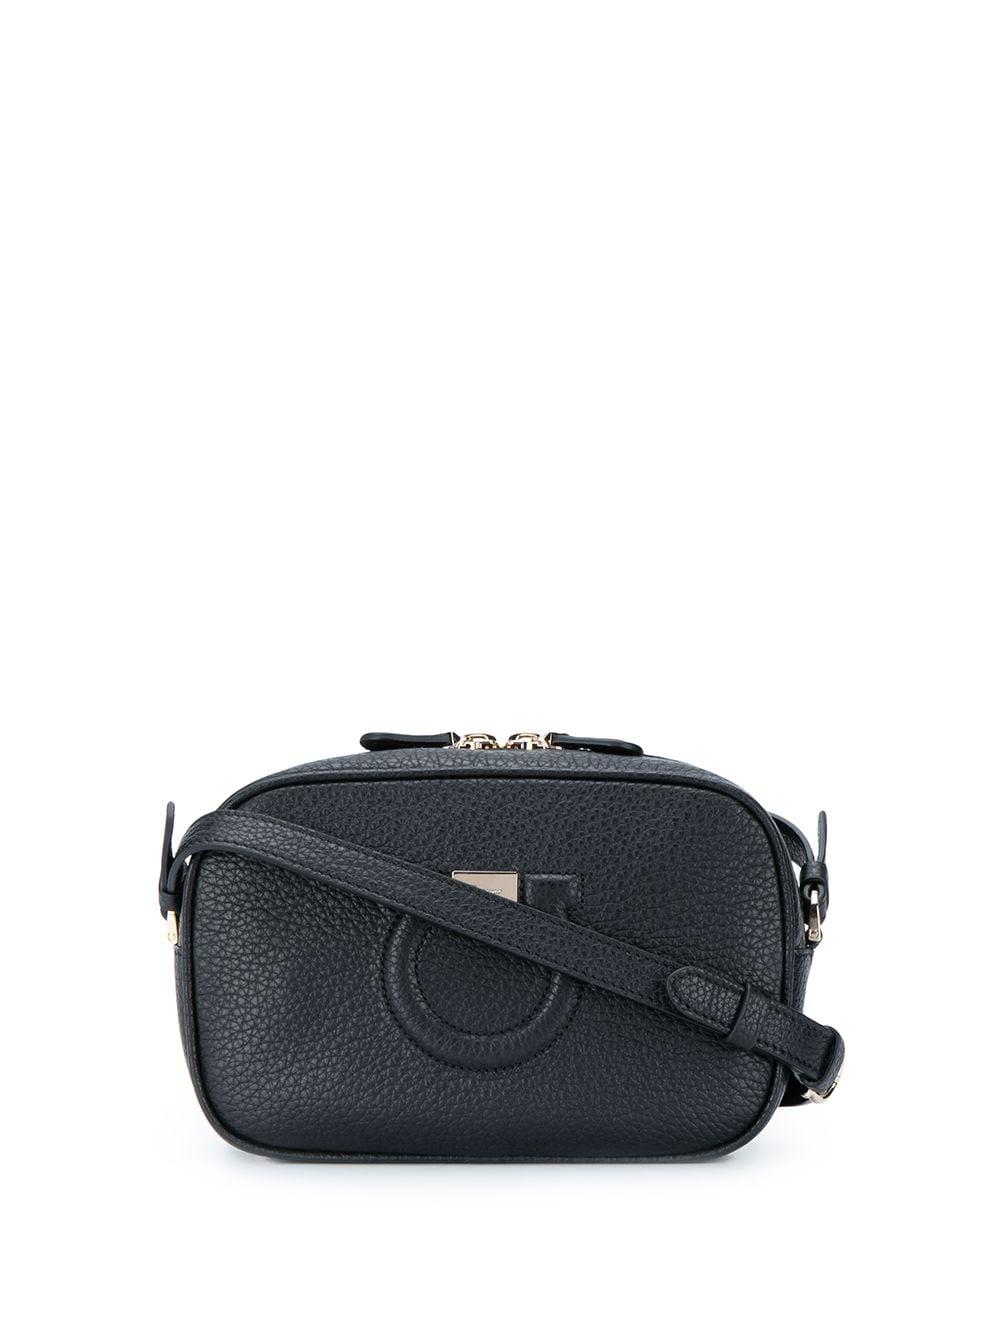 City Leather Crossbody Bag